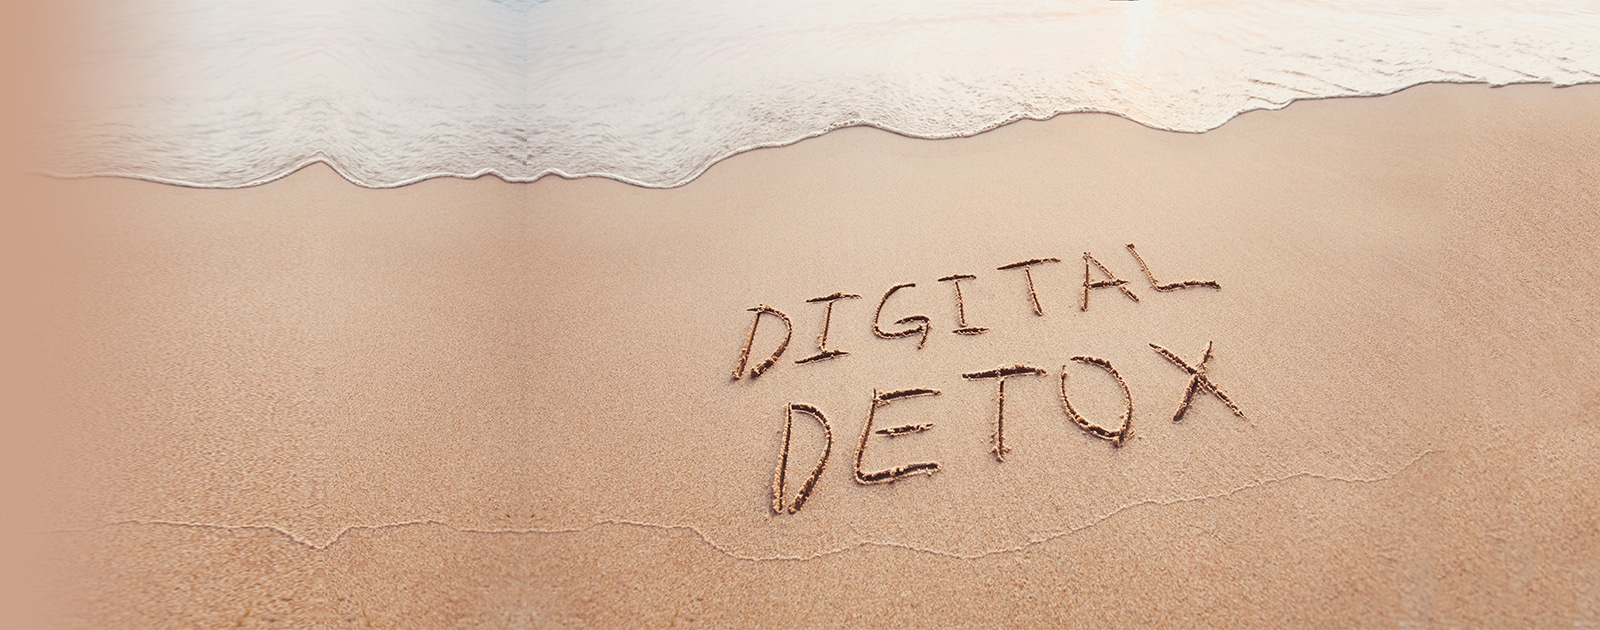 Hypnose et digital detox